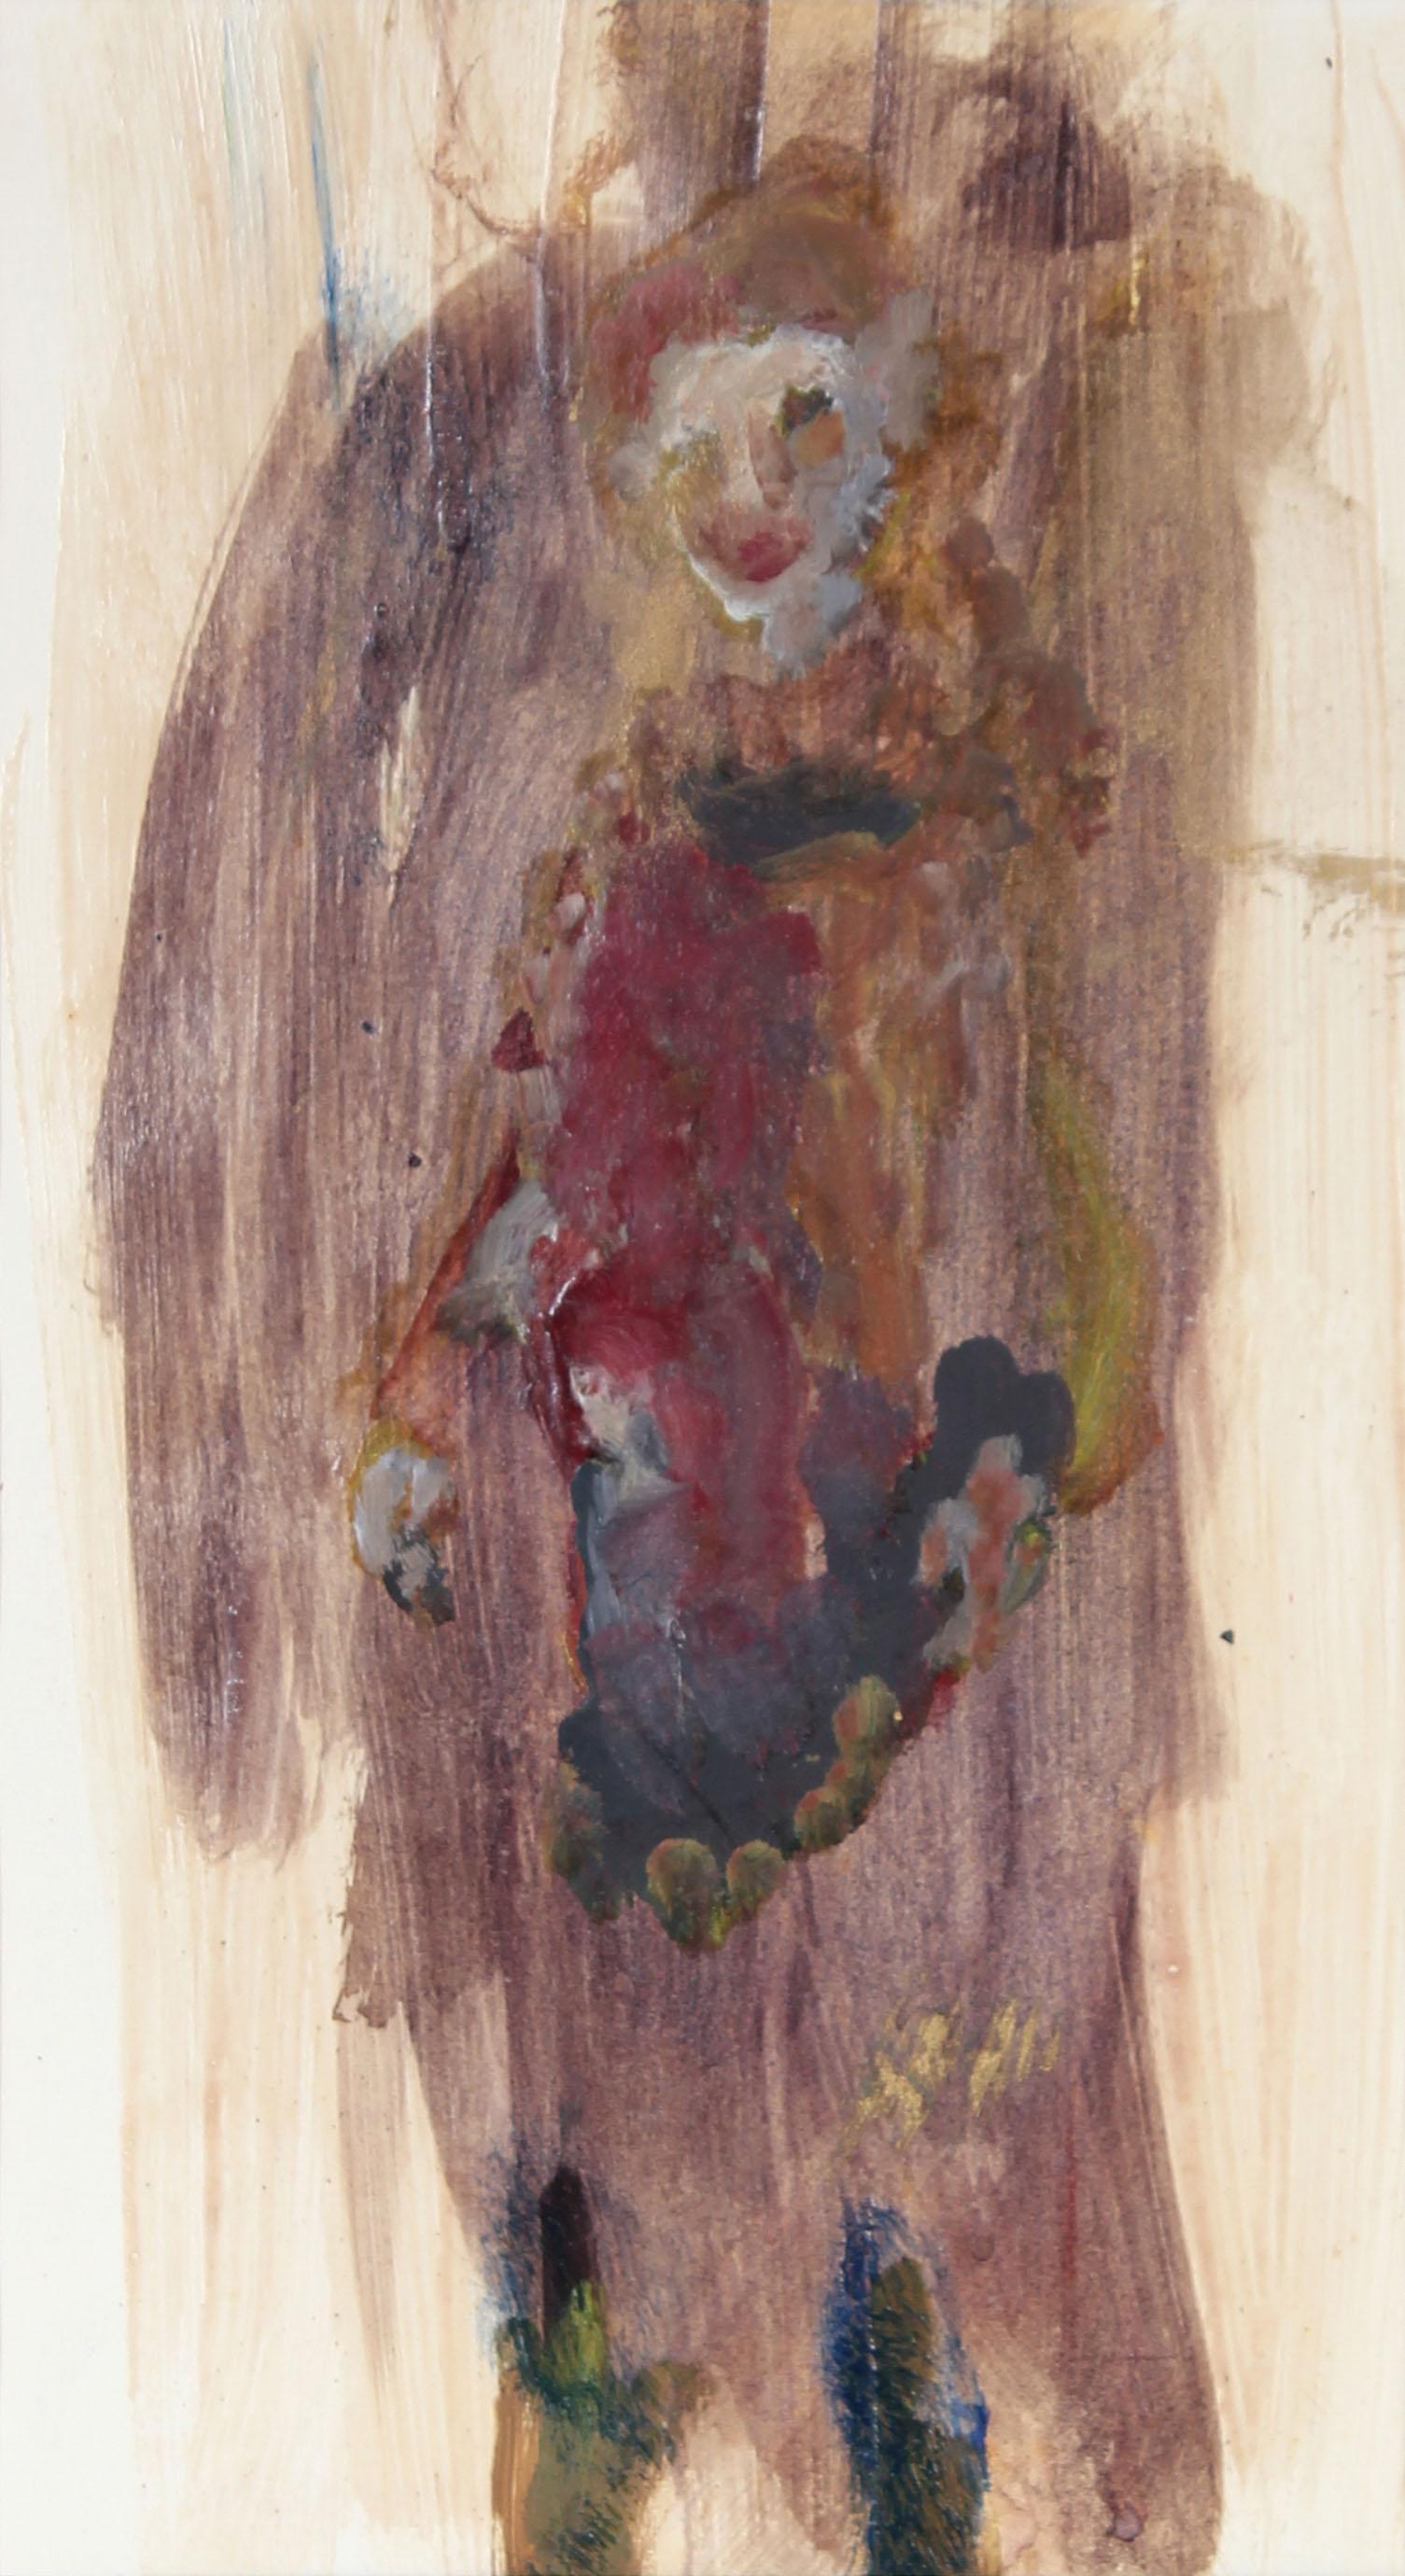 Distemper Painting, Portrait of San Francisco poet Madeline Gleason, Circa 1960s